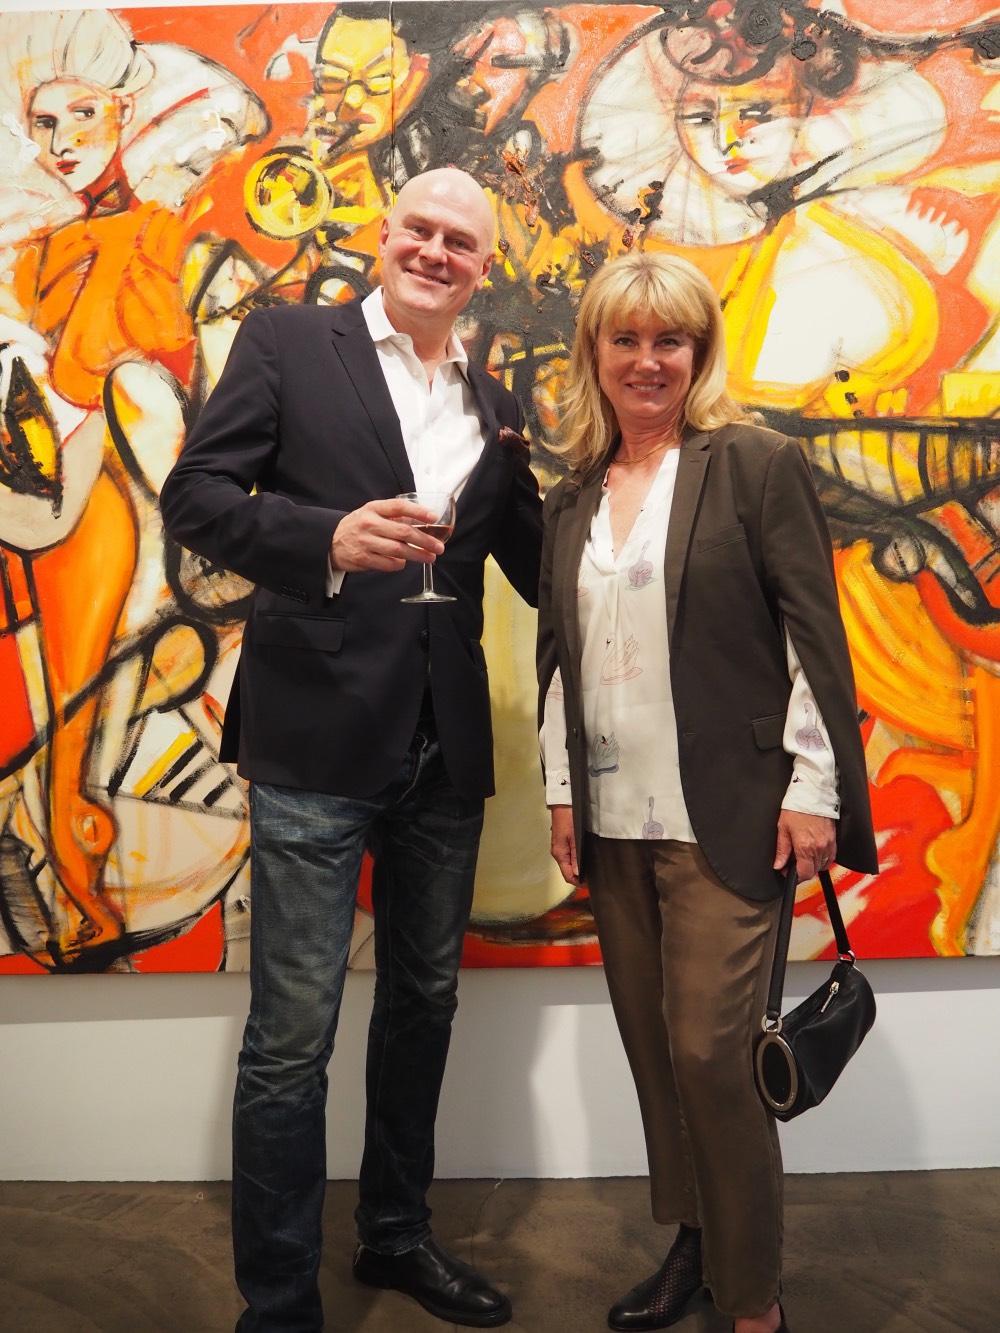 galerie-deschler-vystava-berlin-3.